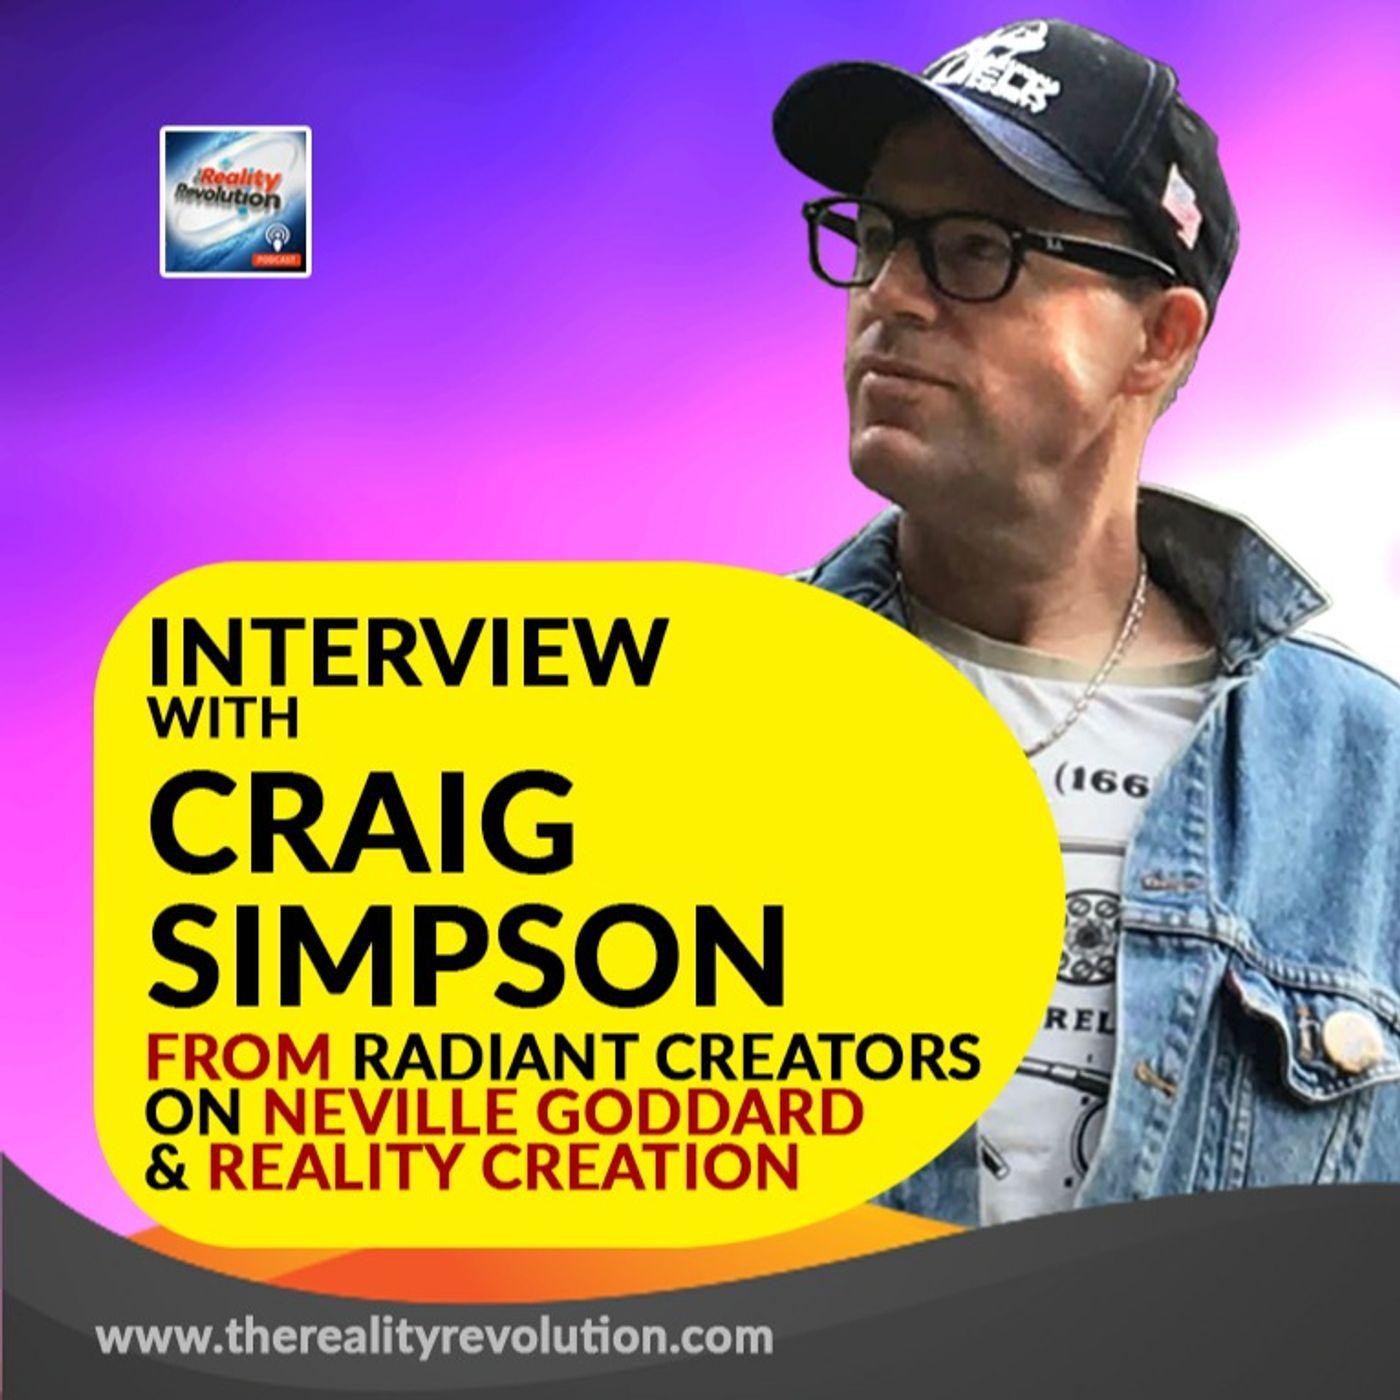 Interview with Craig Simpson Of Radiant Creators